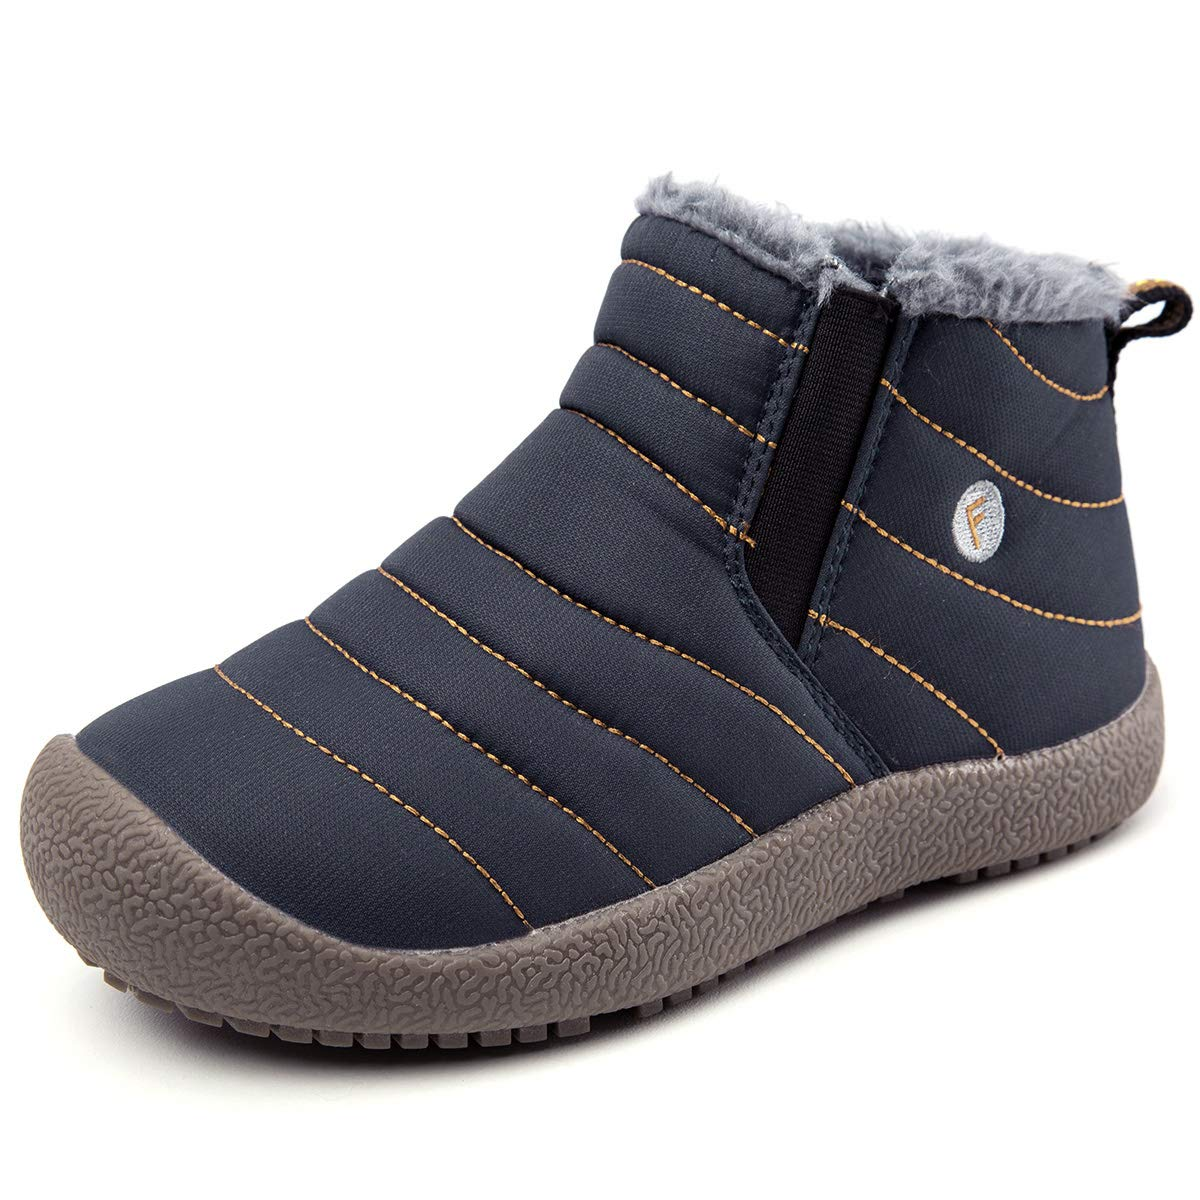 JIAWA Kids Snow Boots Boys Winter Waterproof Boots Girls Slip-on Anti-Slip Fur Lined Warm Booties(Blue 11.5 M US Little Kid)